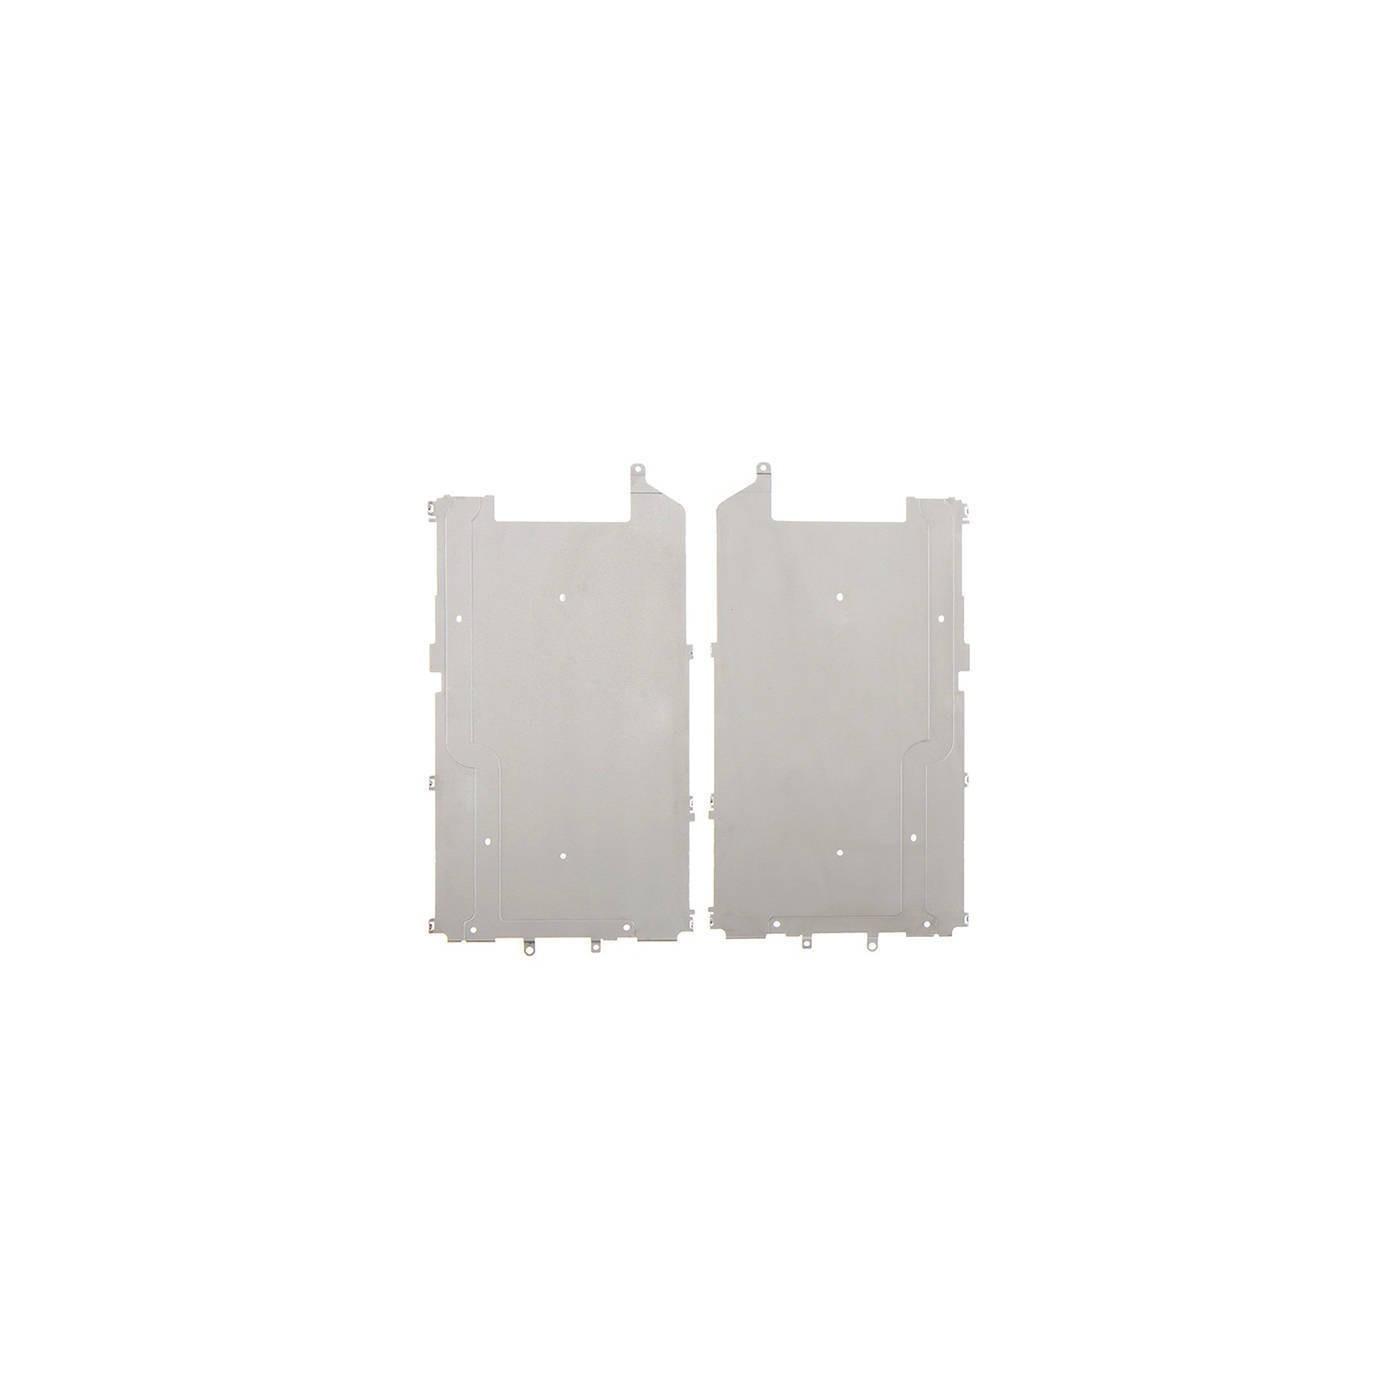 Telaio supporto posteriore display in metallo per Iphone 6 Plus metal plate LCD